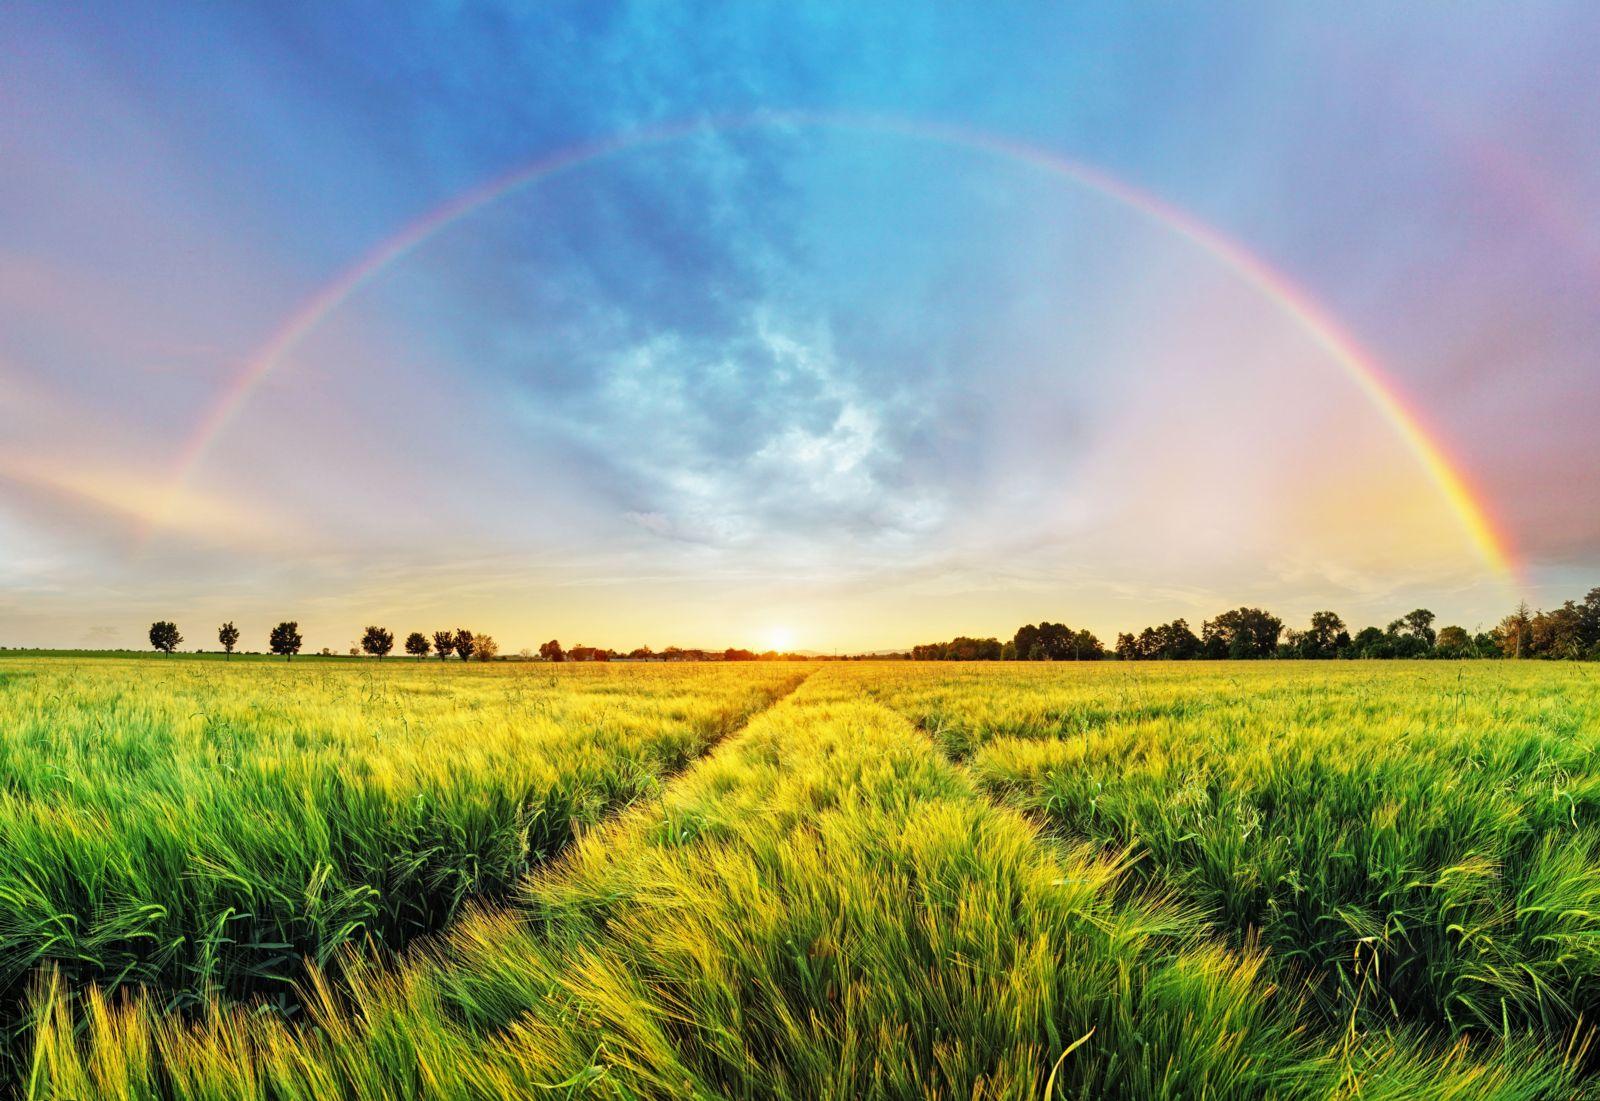 rainbow in a field